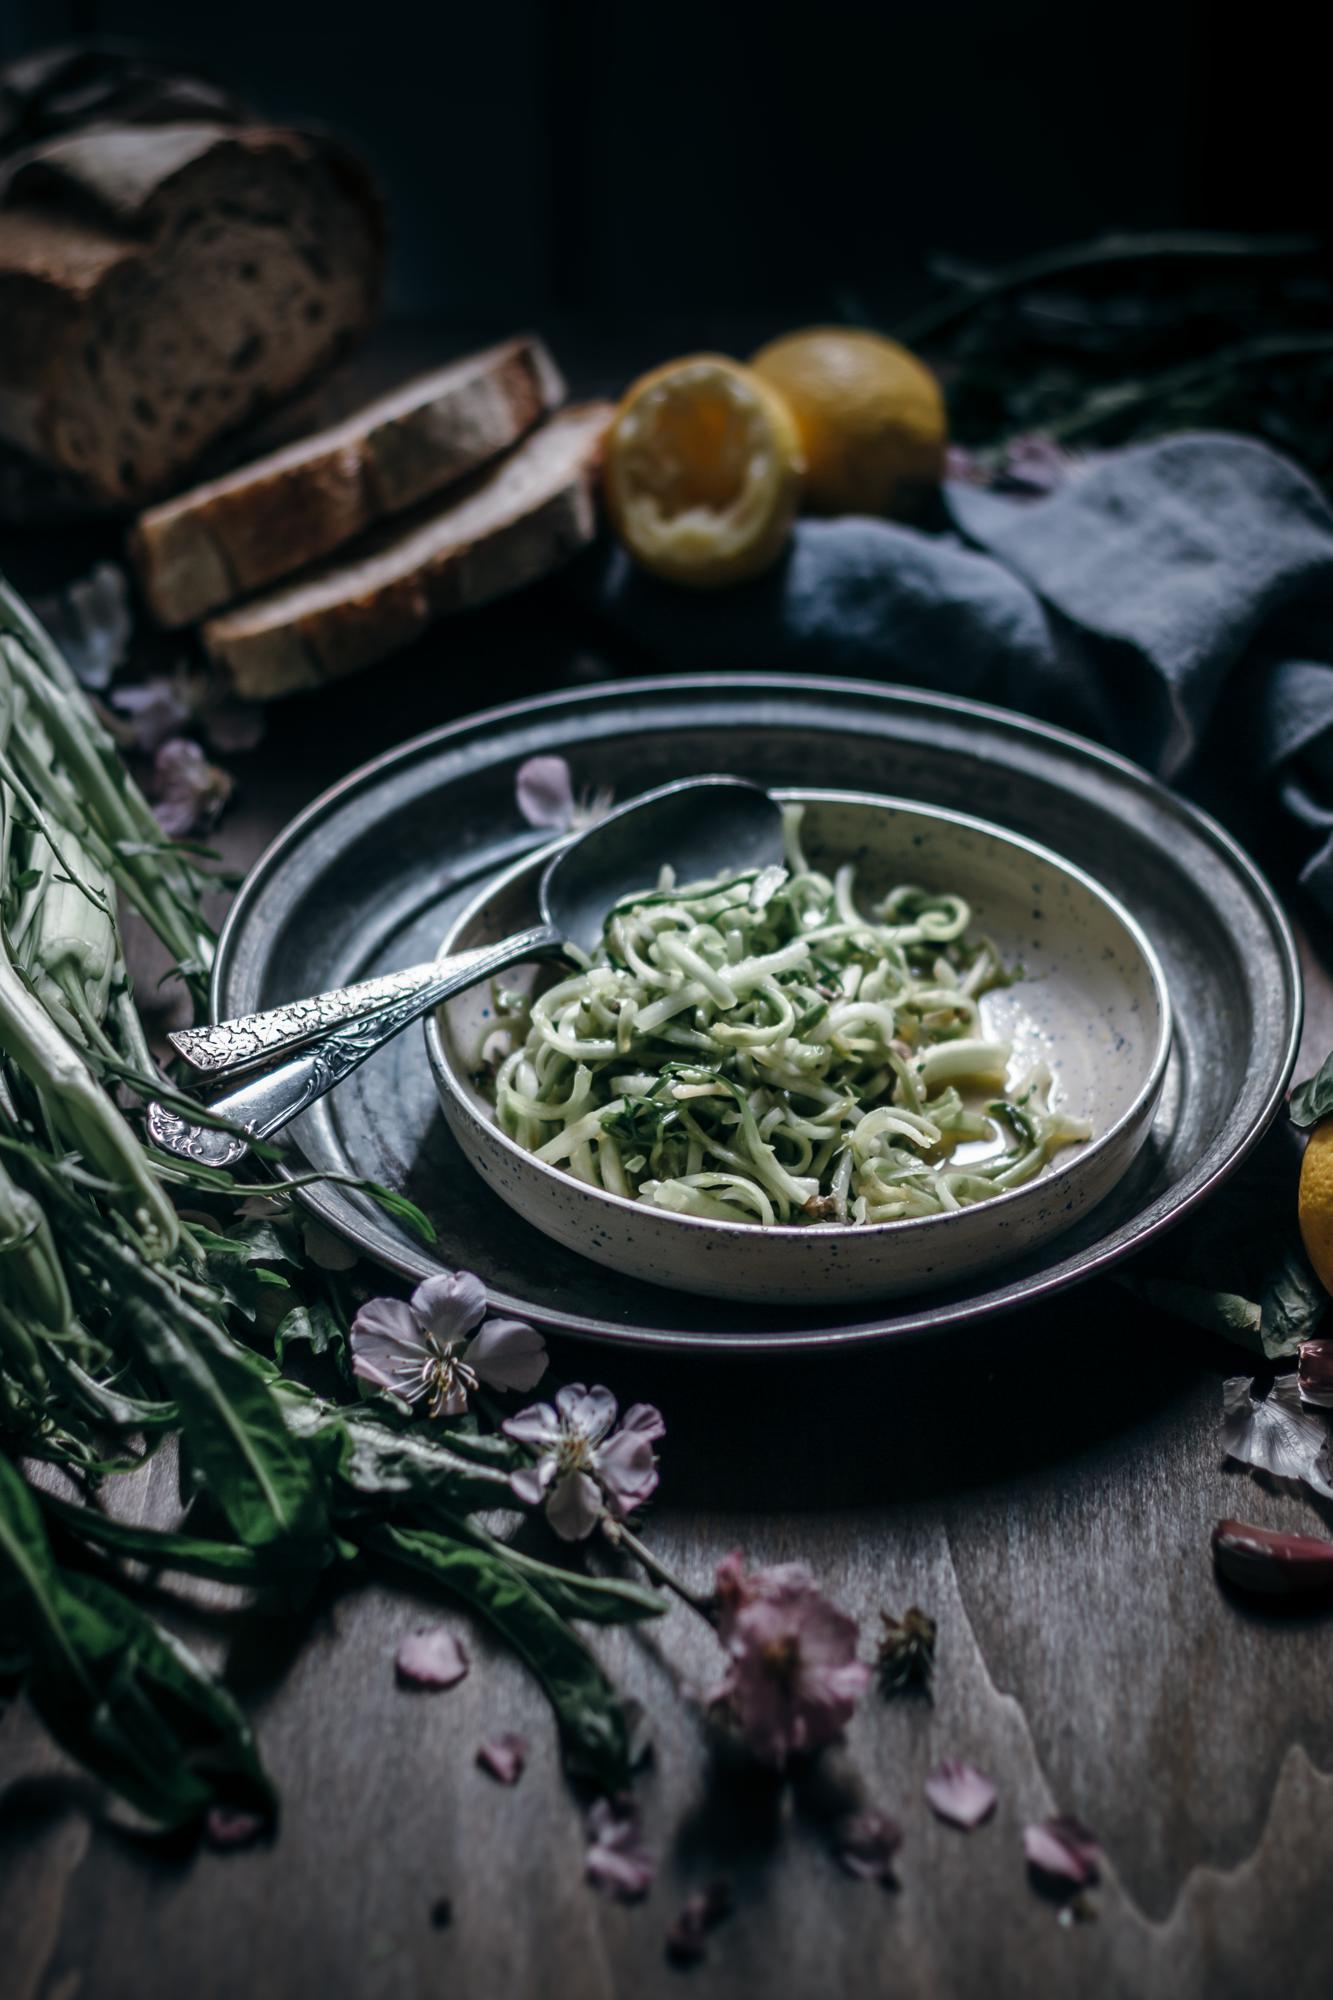 10 Striking Food Memories from 10+ Years of Living in Italy by Saghar Setareh | Lab Noon